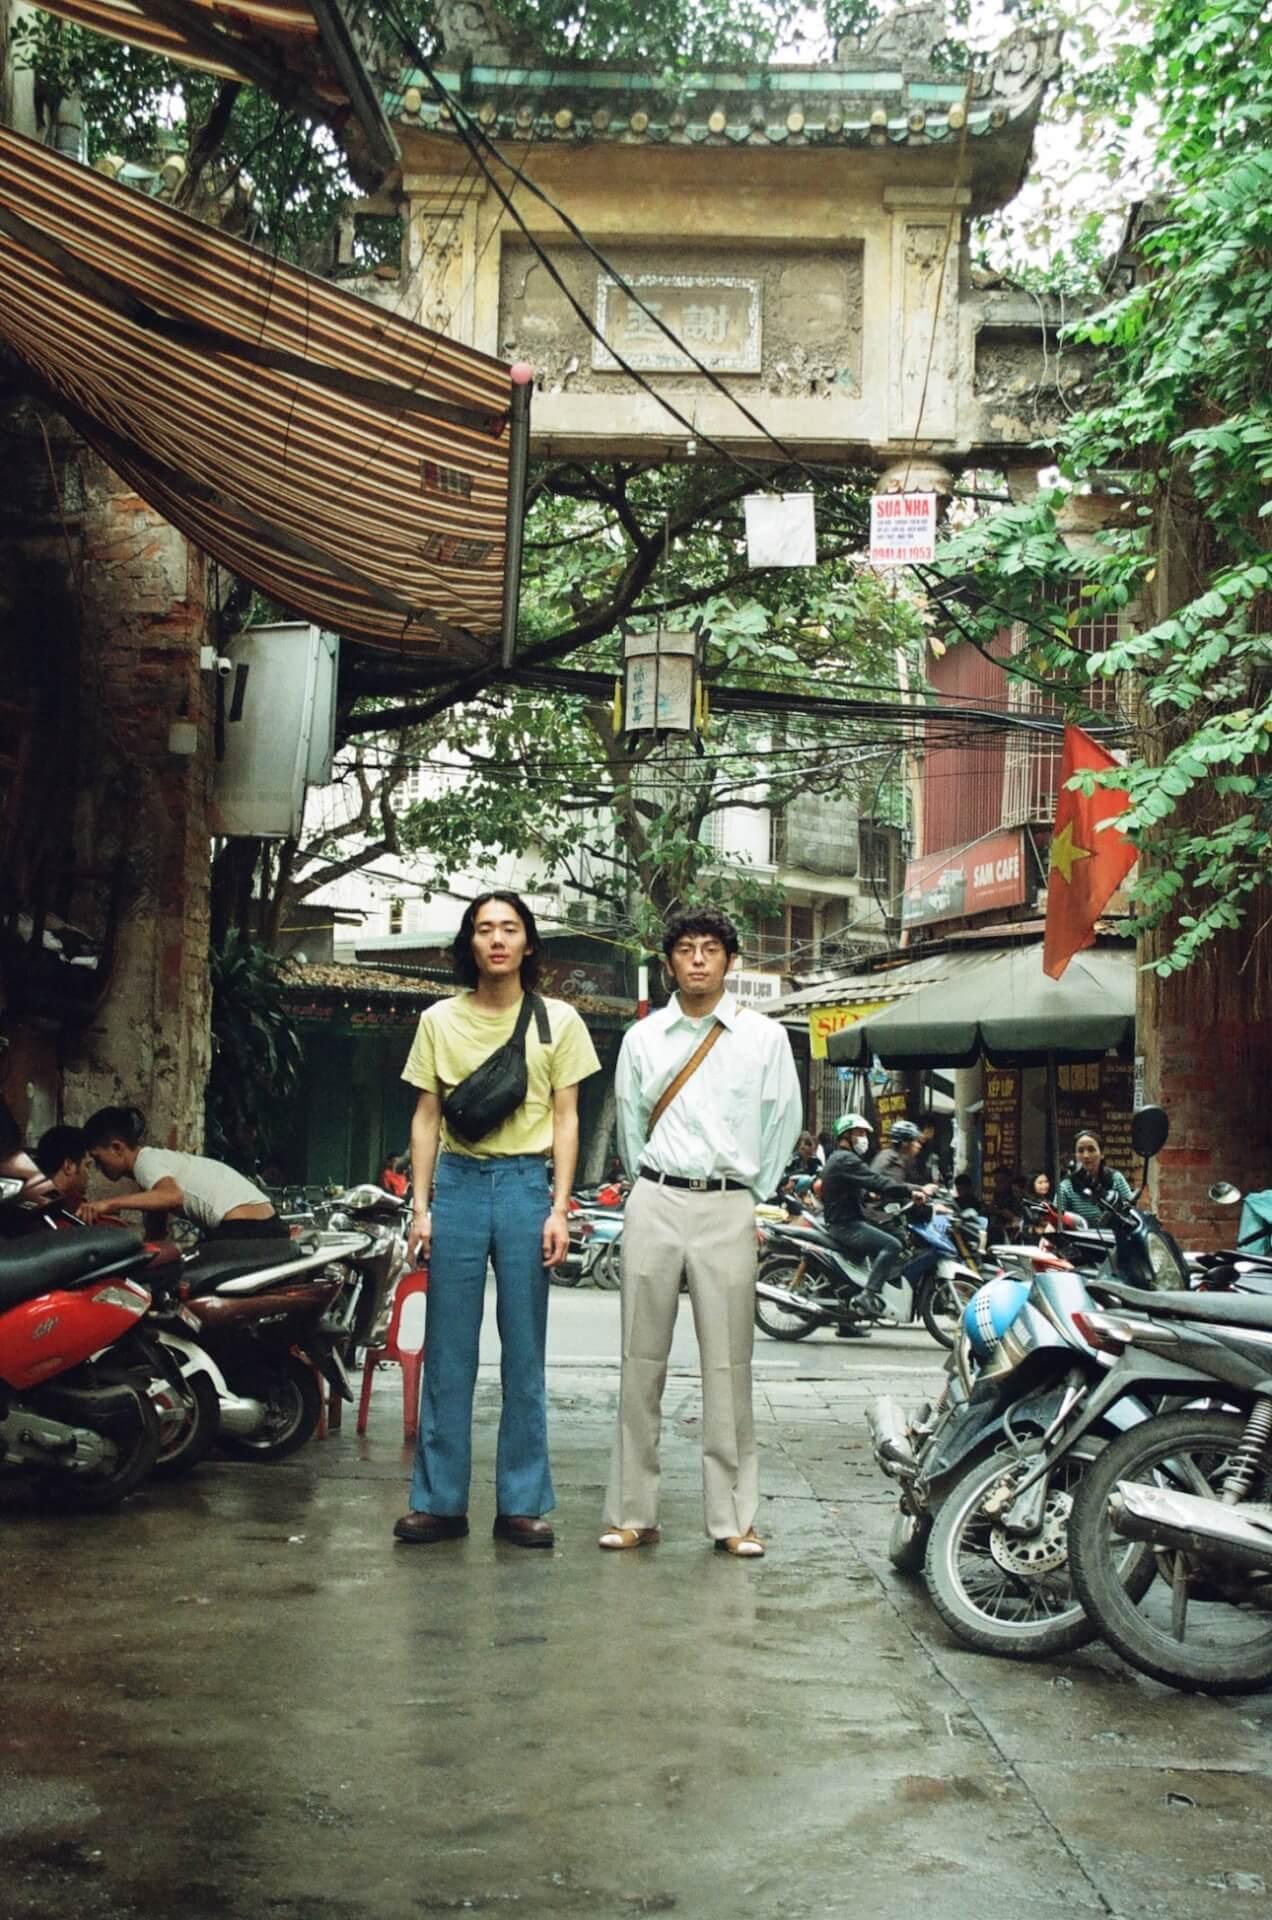 MIZがアコースティックギターで織りなすベトナムの情景―玉置周啓と加藤成順のロードムービを辿る interview_miz_11